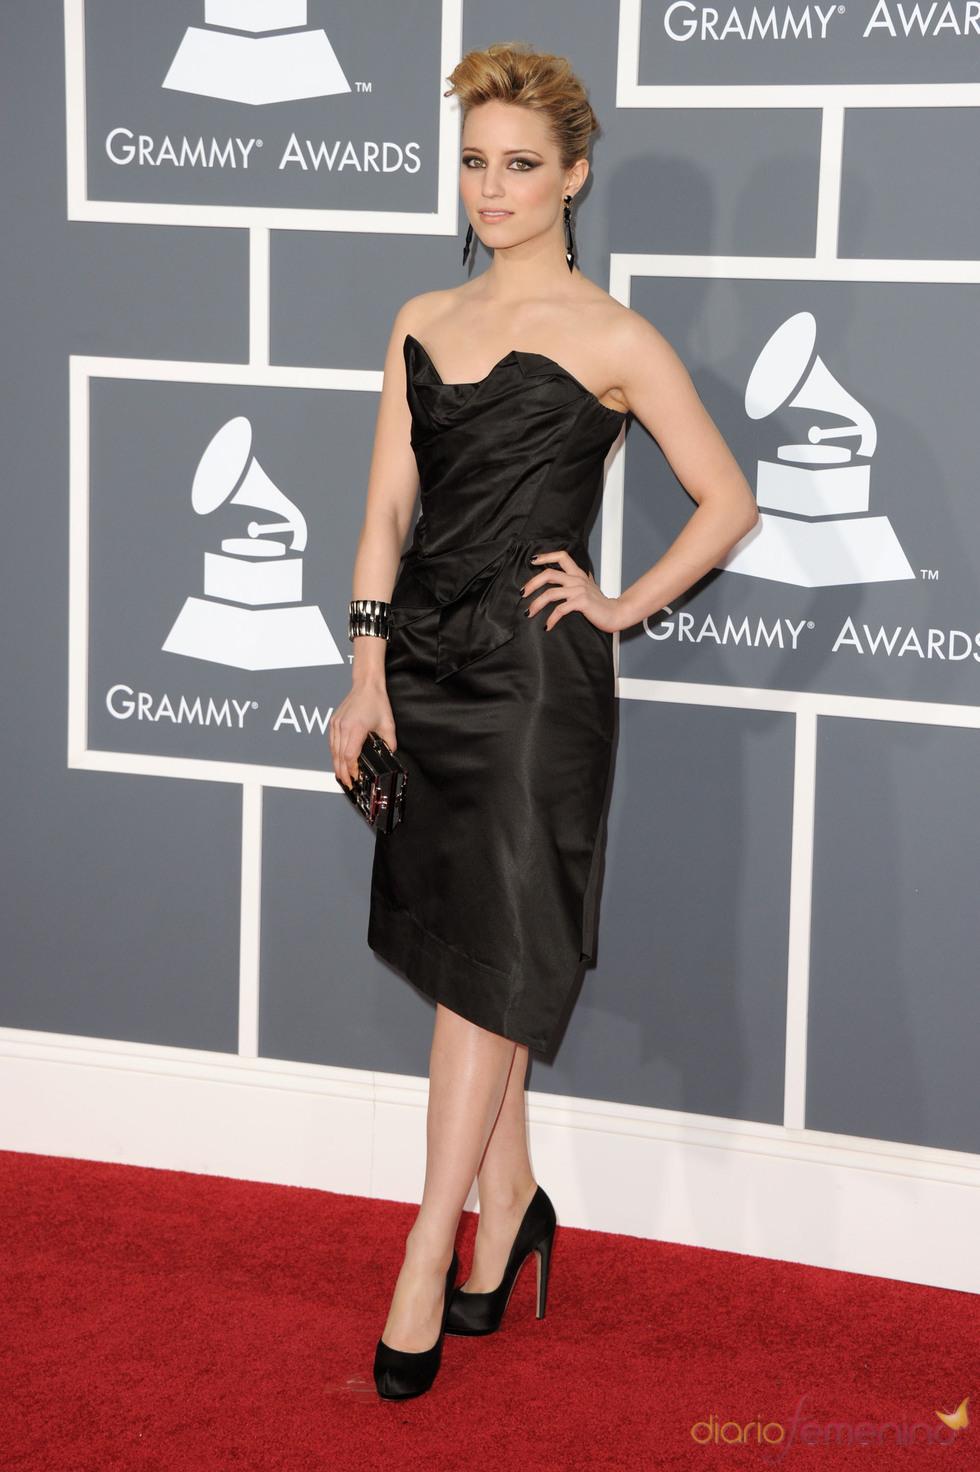 Dianna Agron en los Grammy 2011